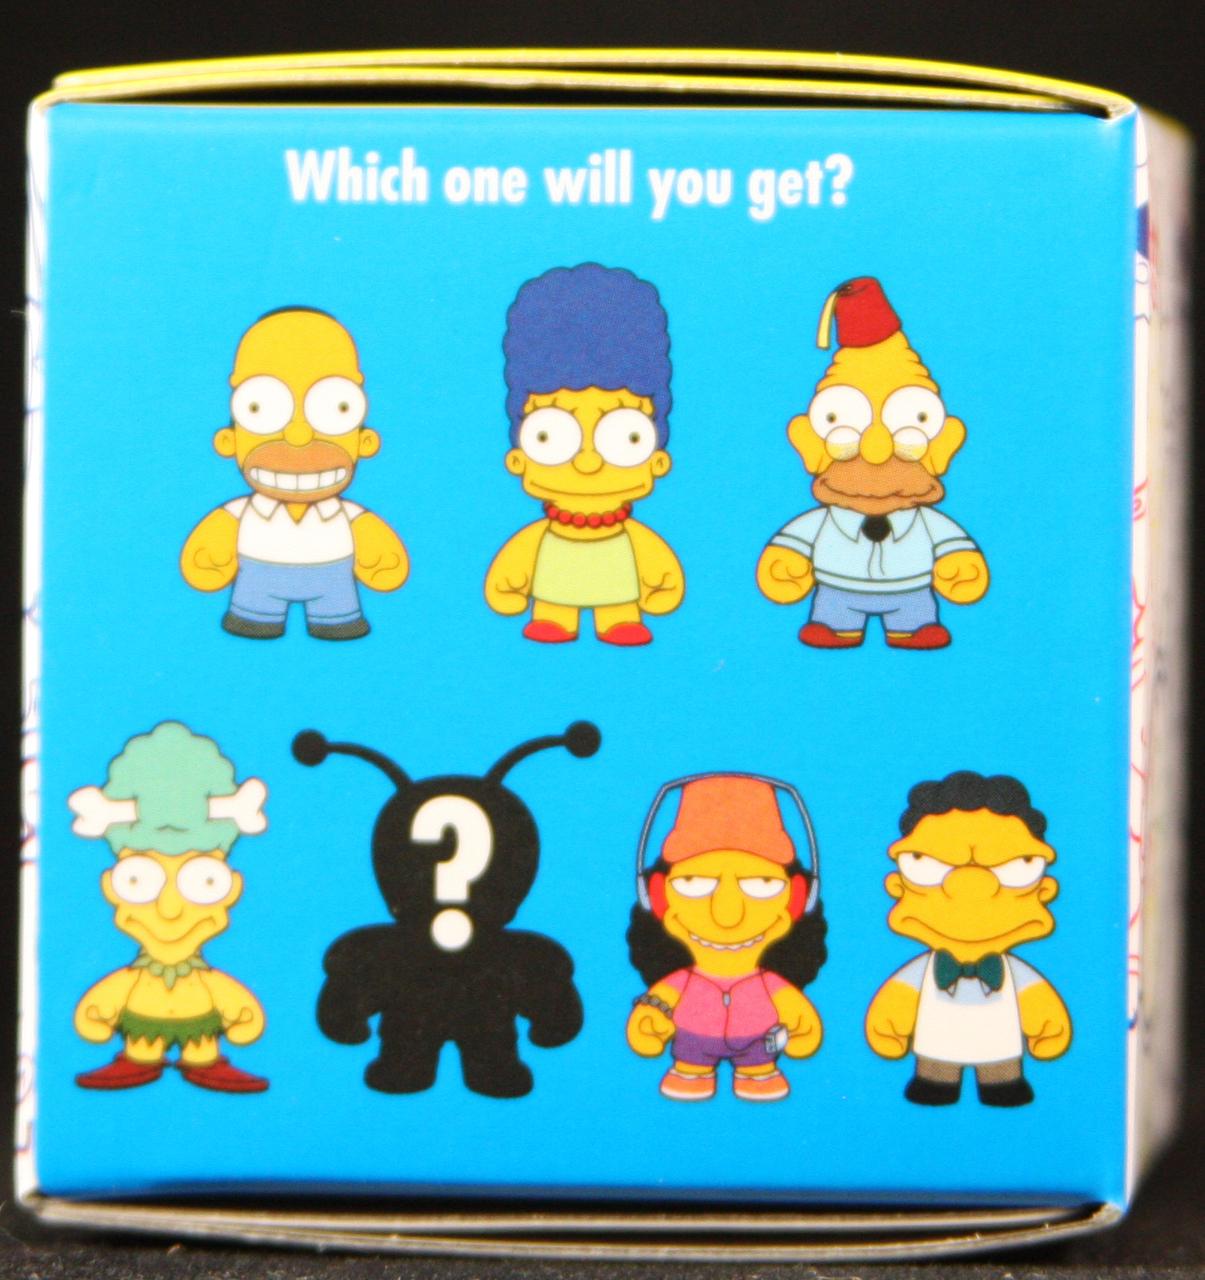 Kidrobot The Simpsons Keychain Blind Box Bart Simpson BRAND NEW In Box!